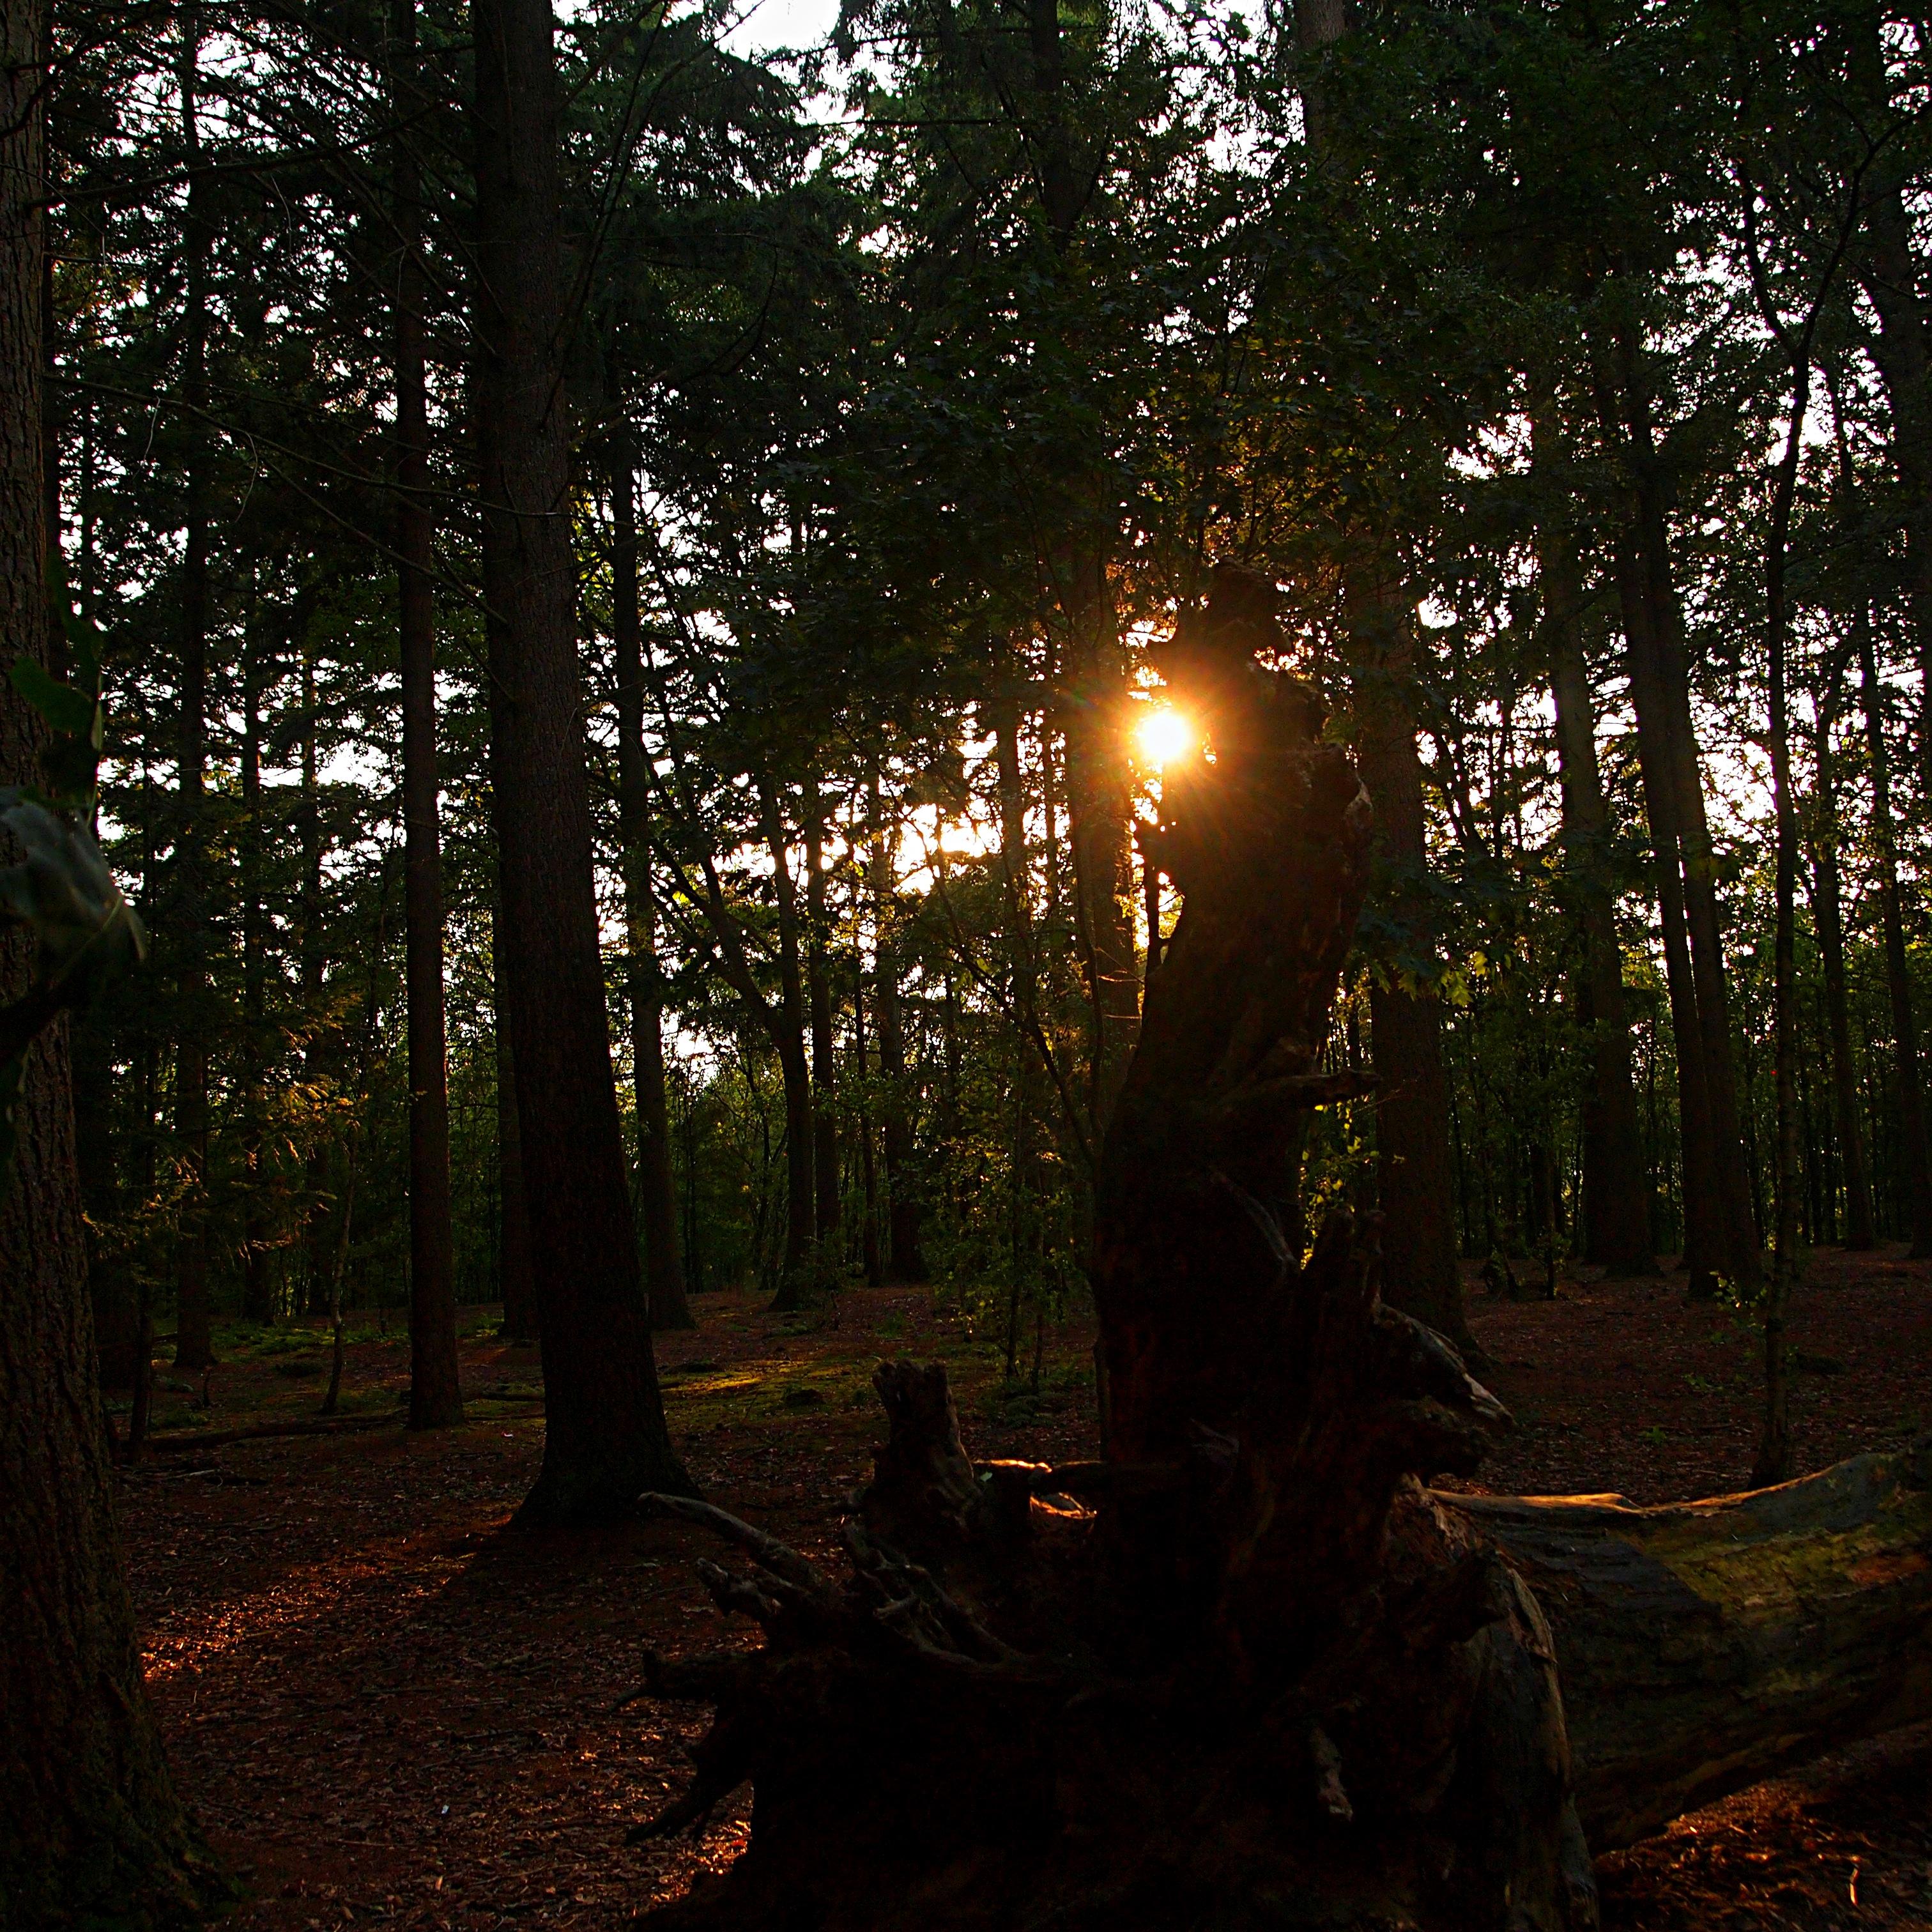 Tree Nature Forest Light Plant Sunset Sunlight Morning Leaf Atmosphere Dark Evening Jungle Autumn Contrast Darkness